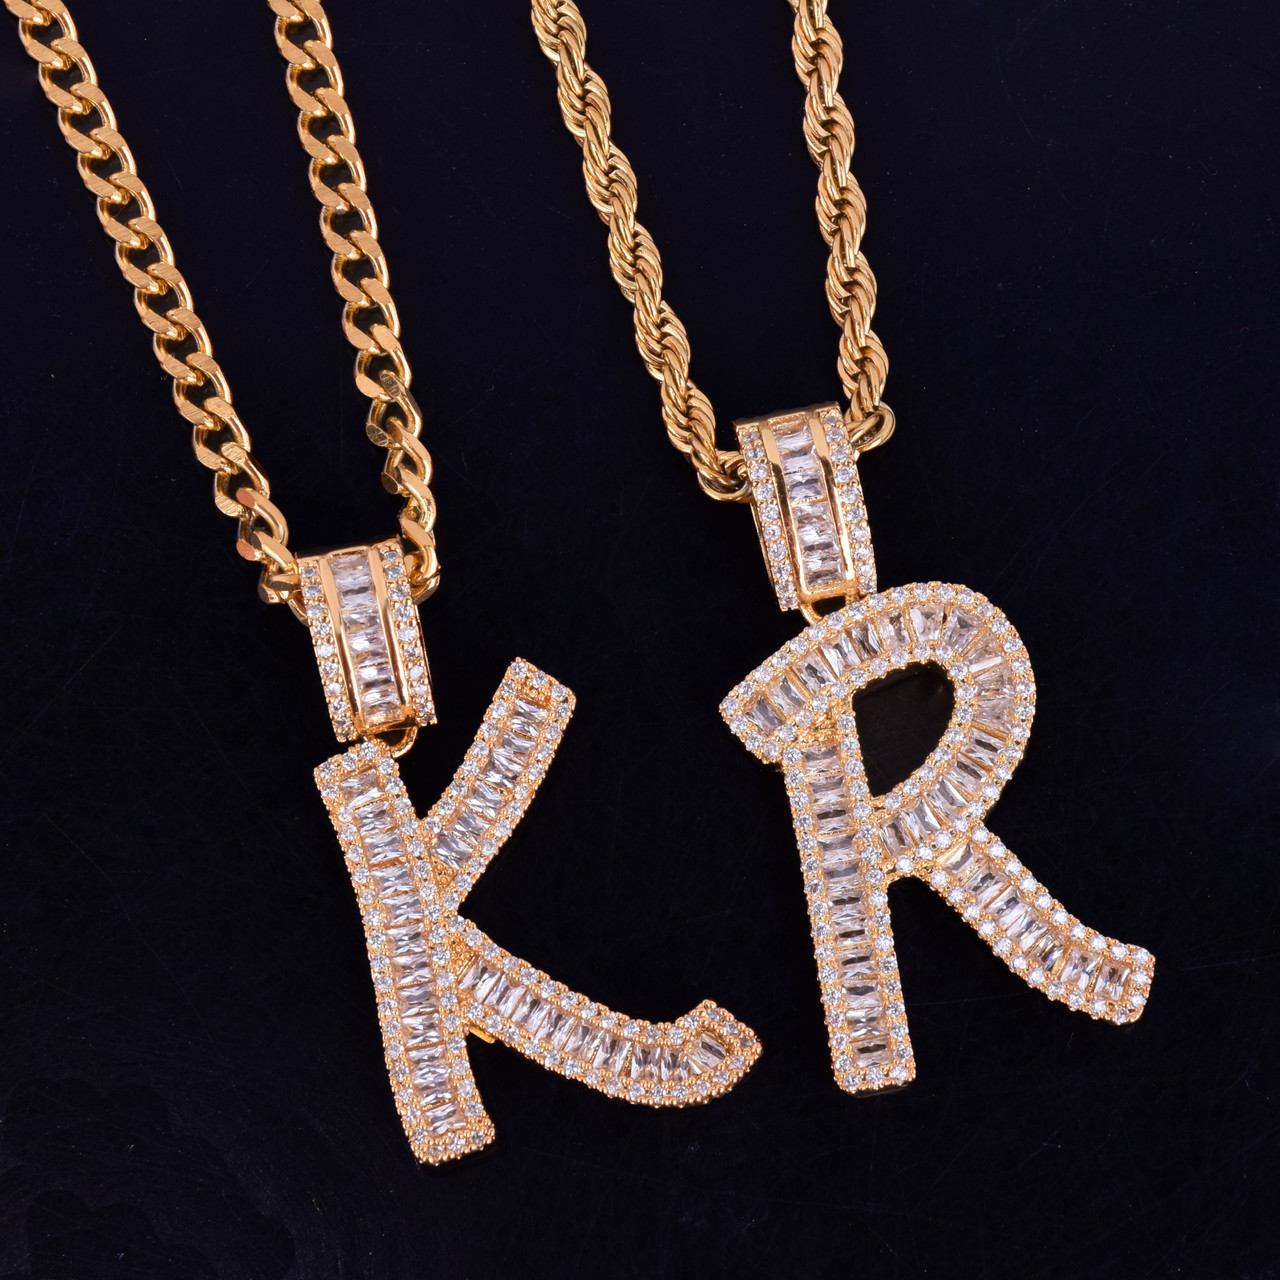 L Premium Bling 925 Sterling Silver Letter Pendant L gold